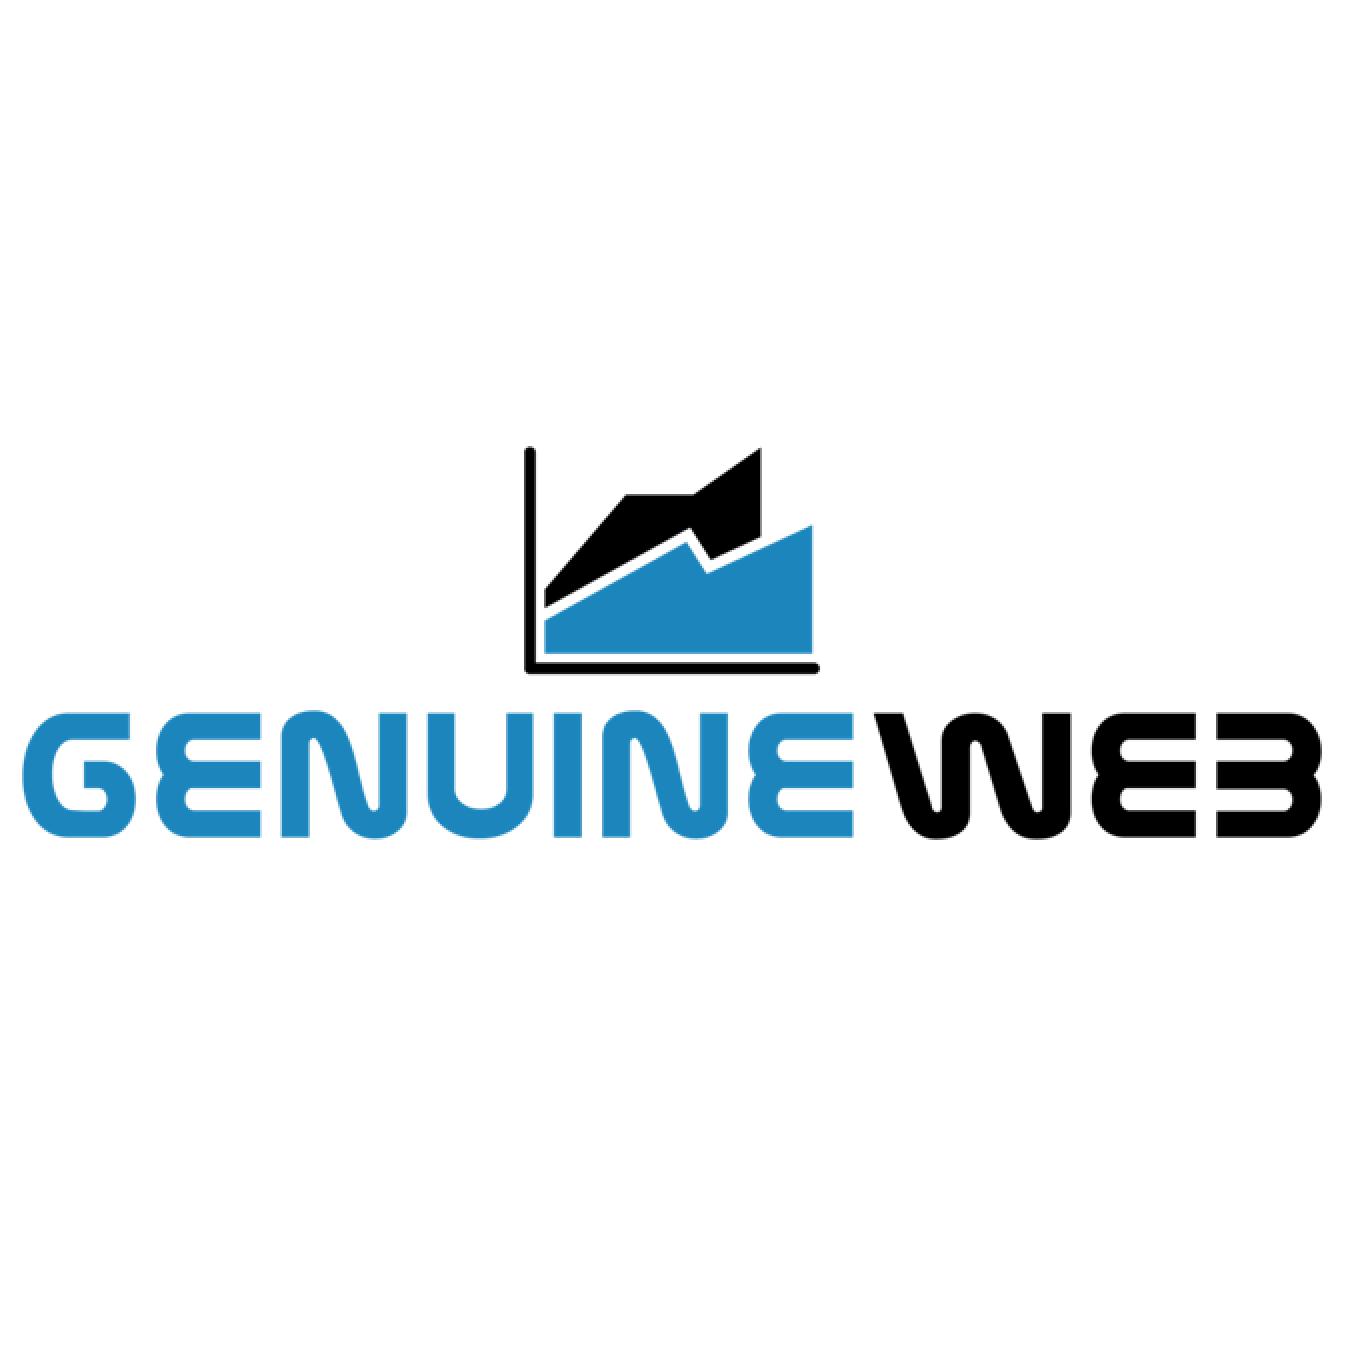 Genuine Web